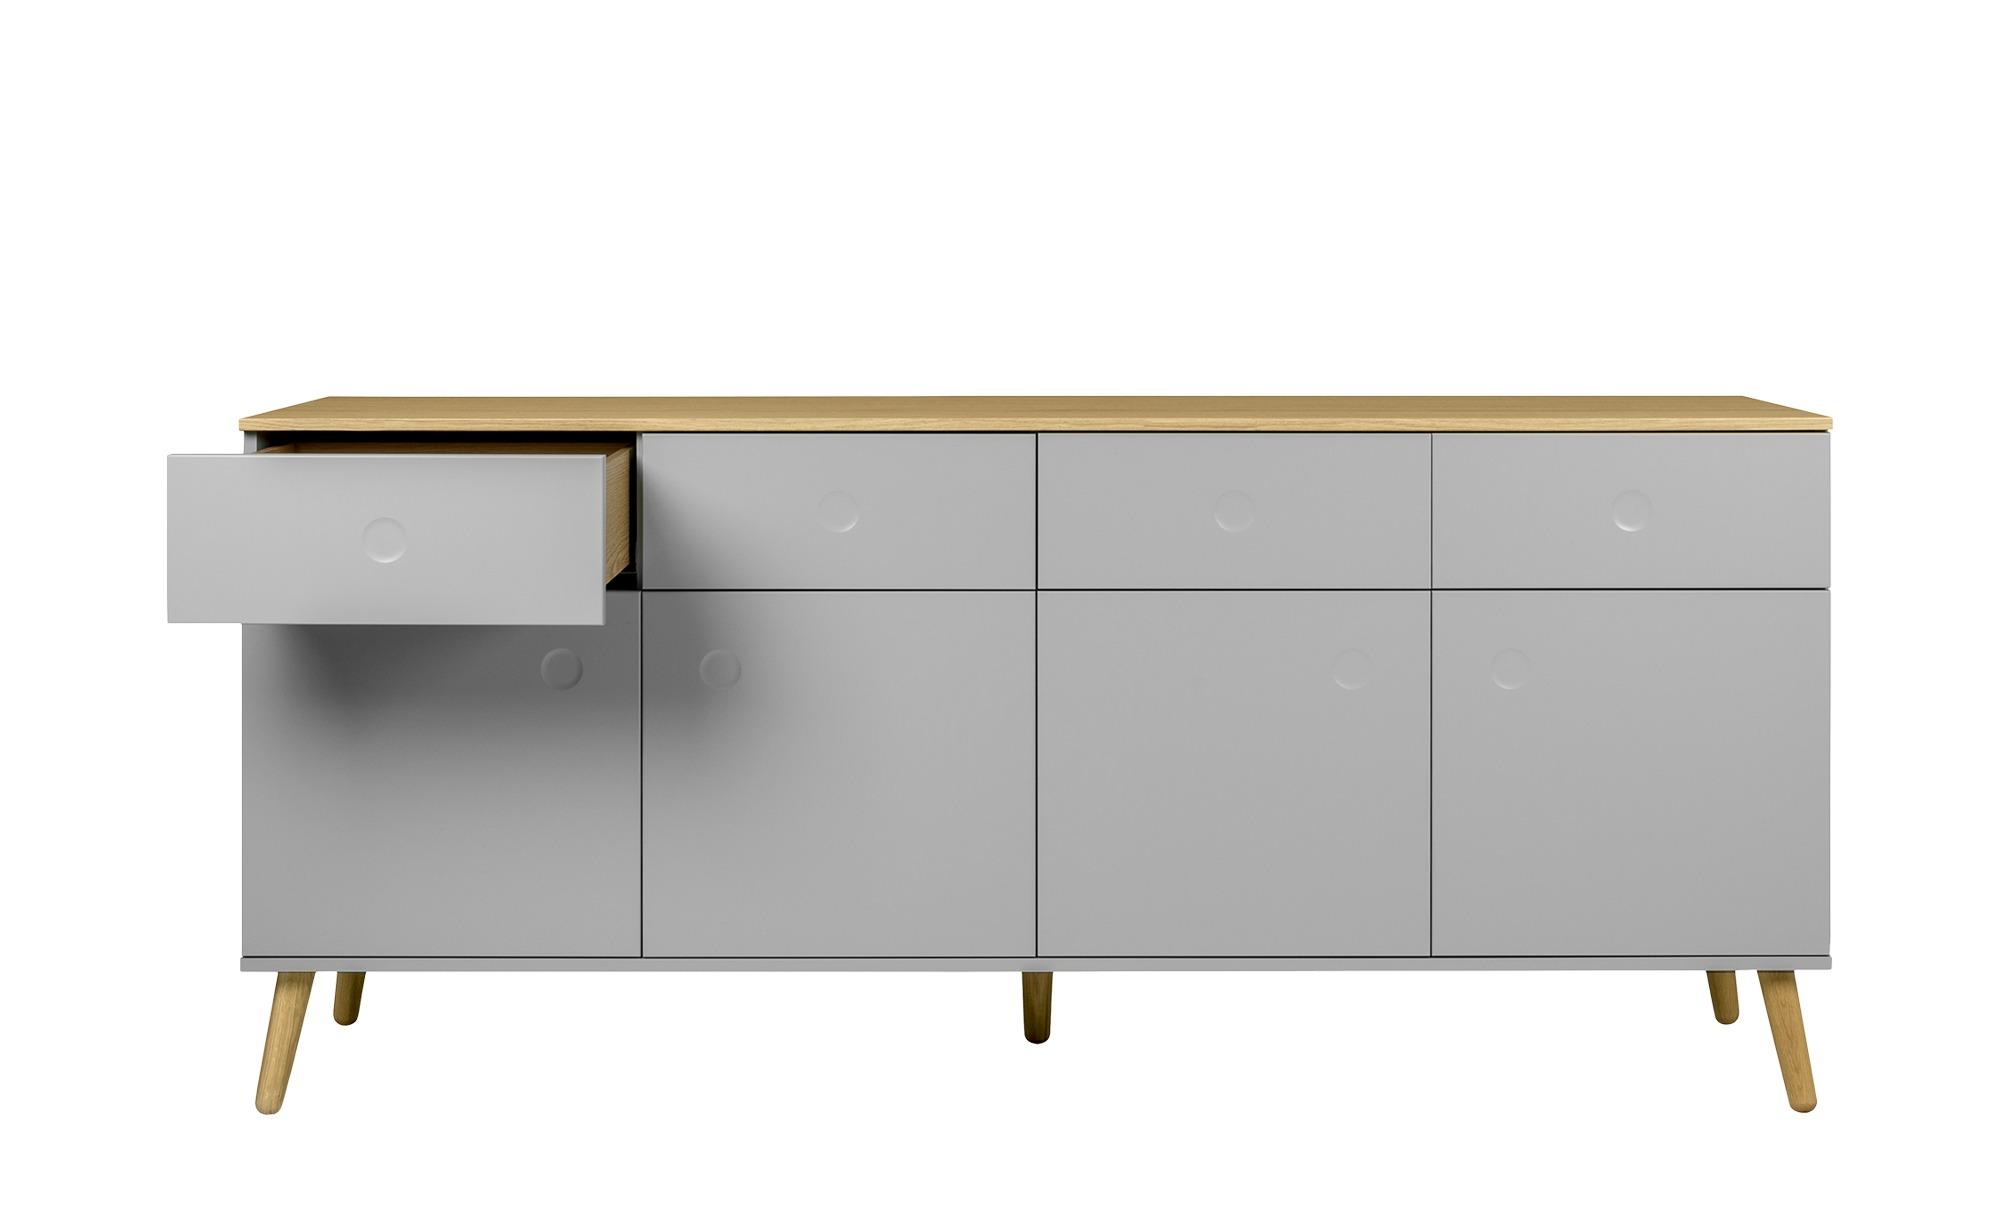 Kuche Sideboard Grau – Caseconrad.com